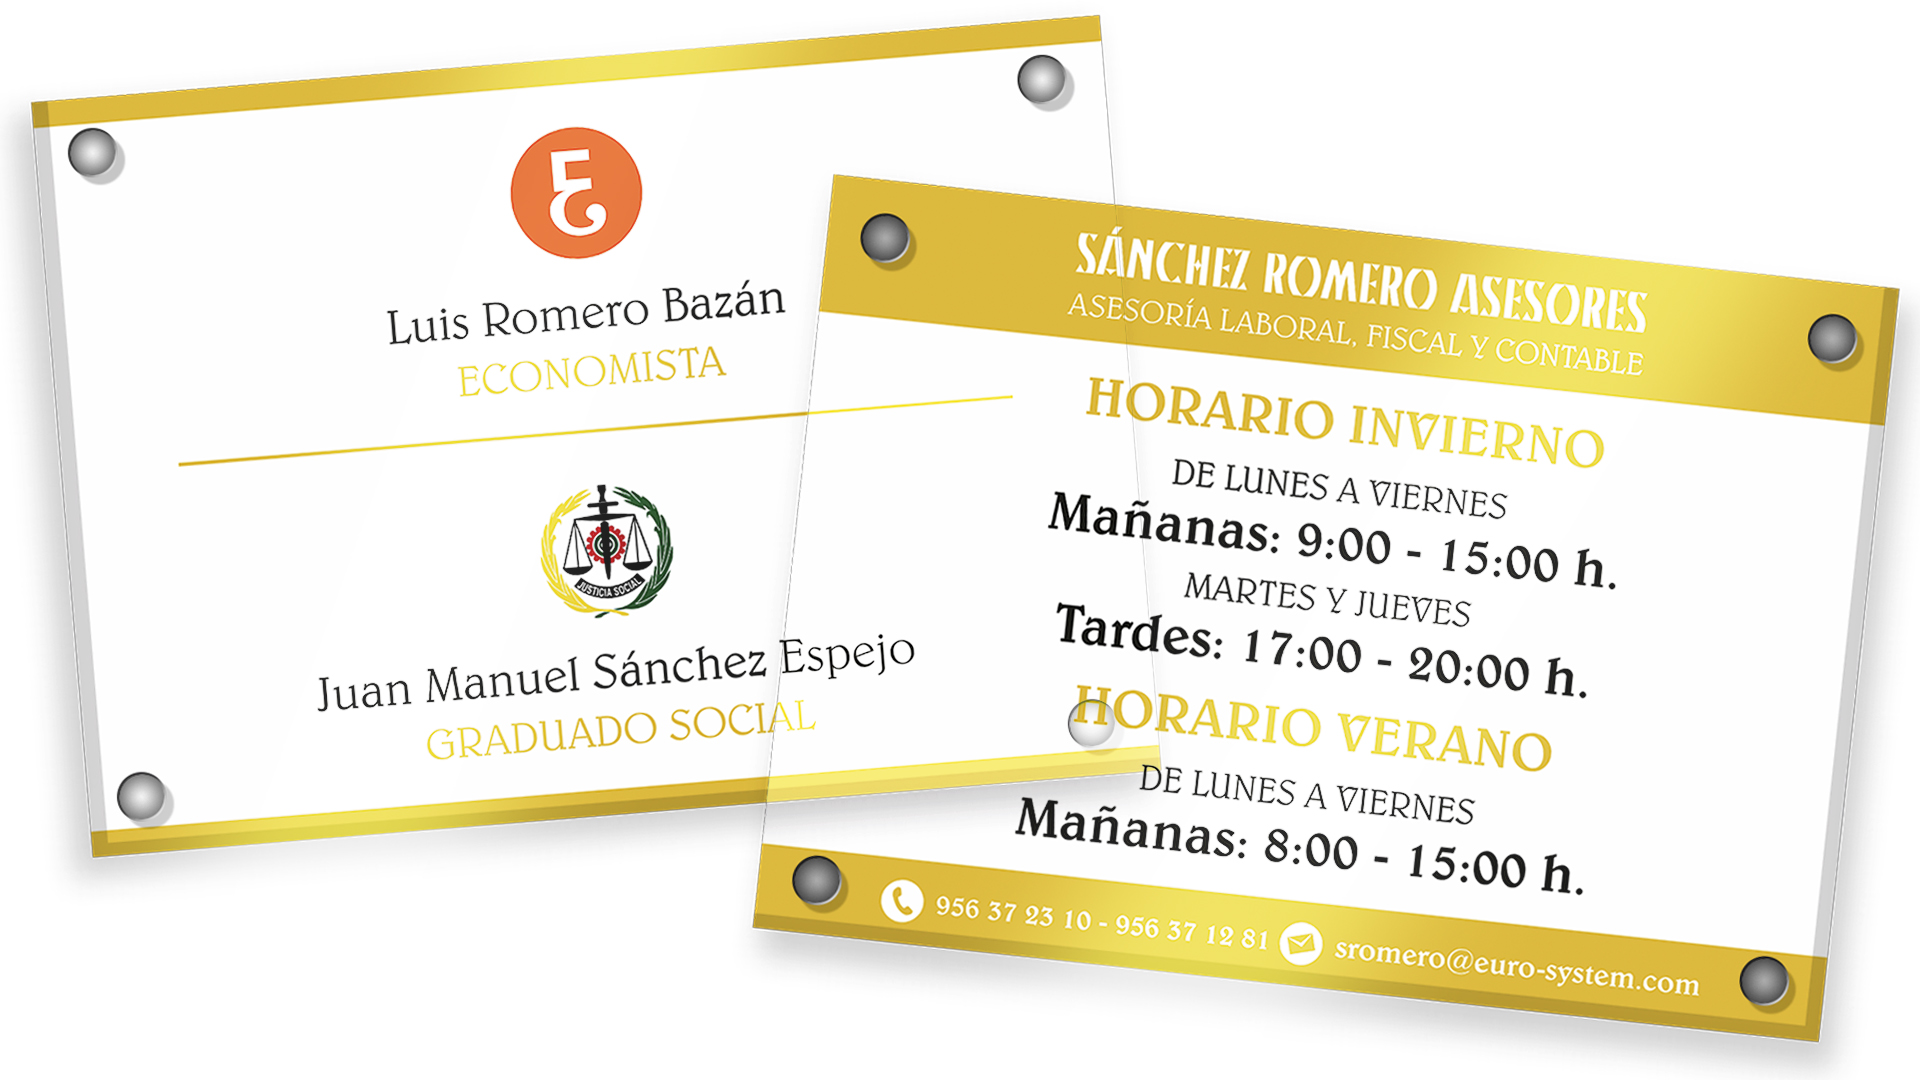 SÁNCHEZ ROMERO ASESORES - Placas de Metacrilato A3